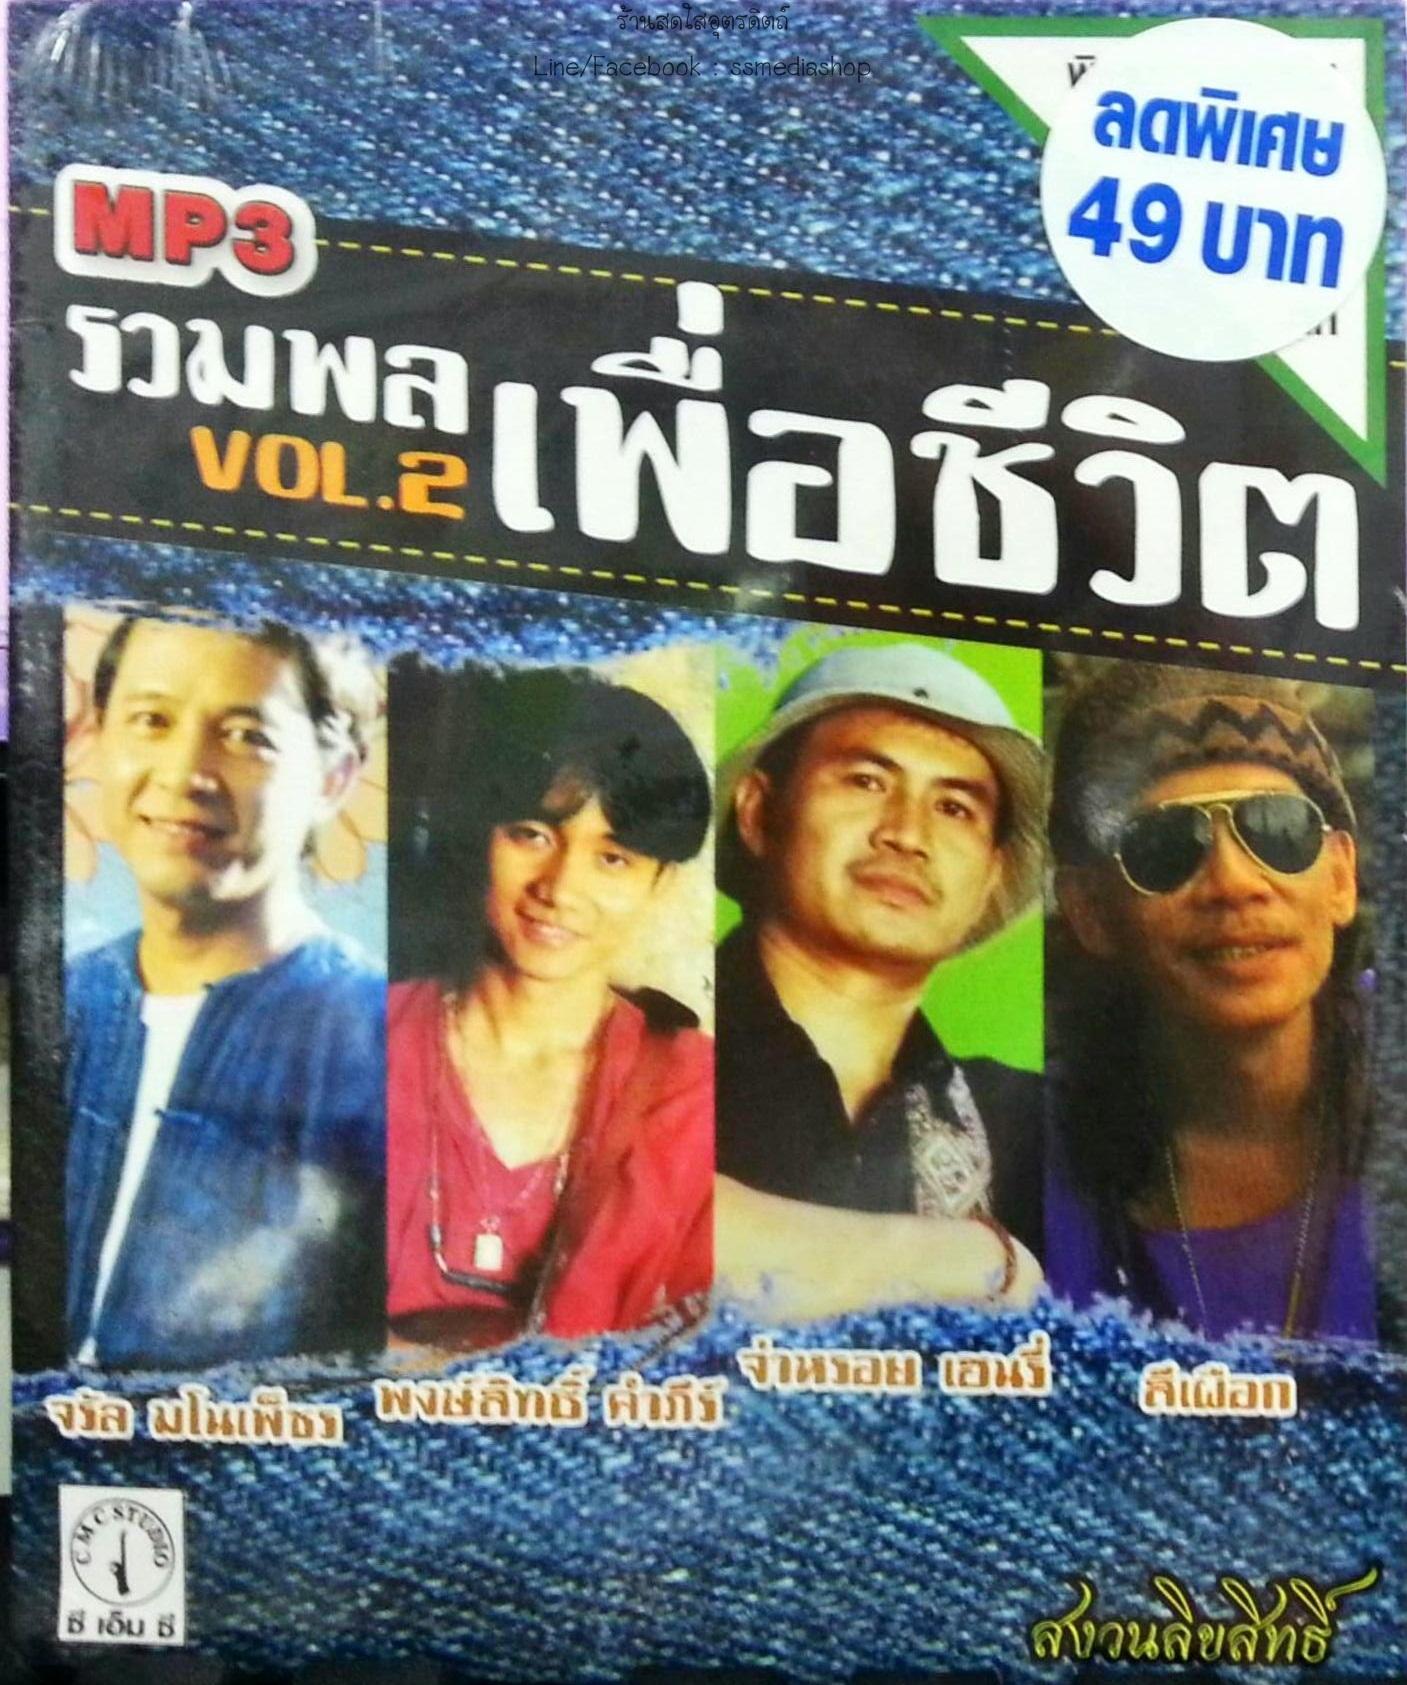 MP3 เพลงเพื่อชีวิต ชุดพิเศษ vol.2